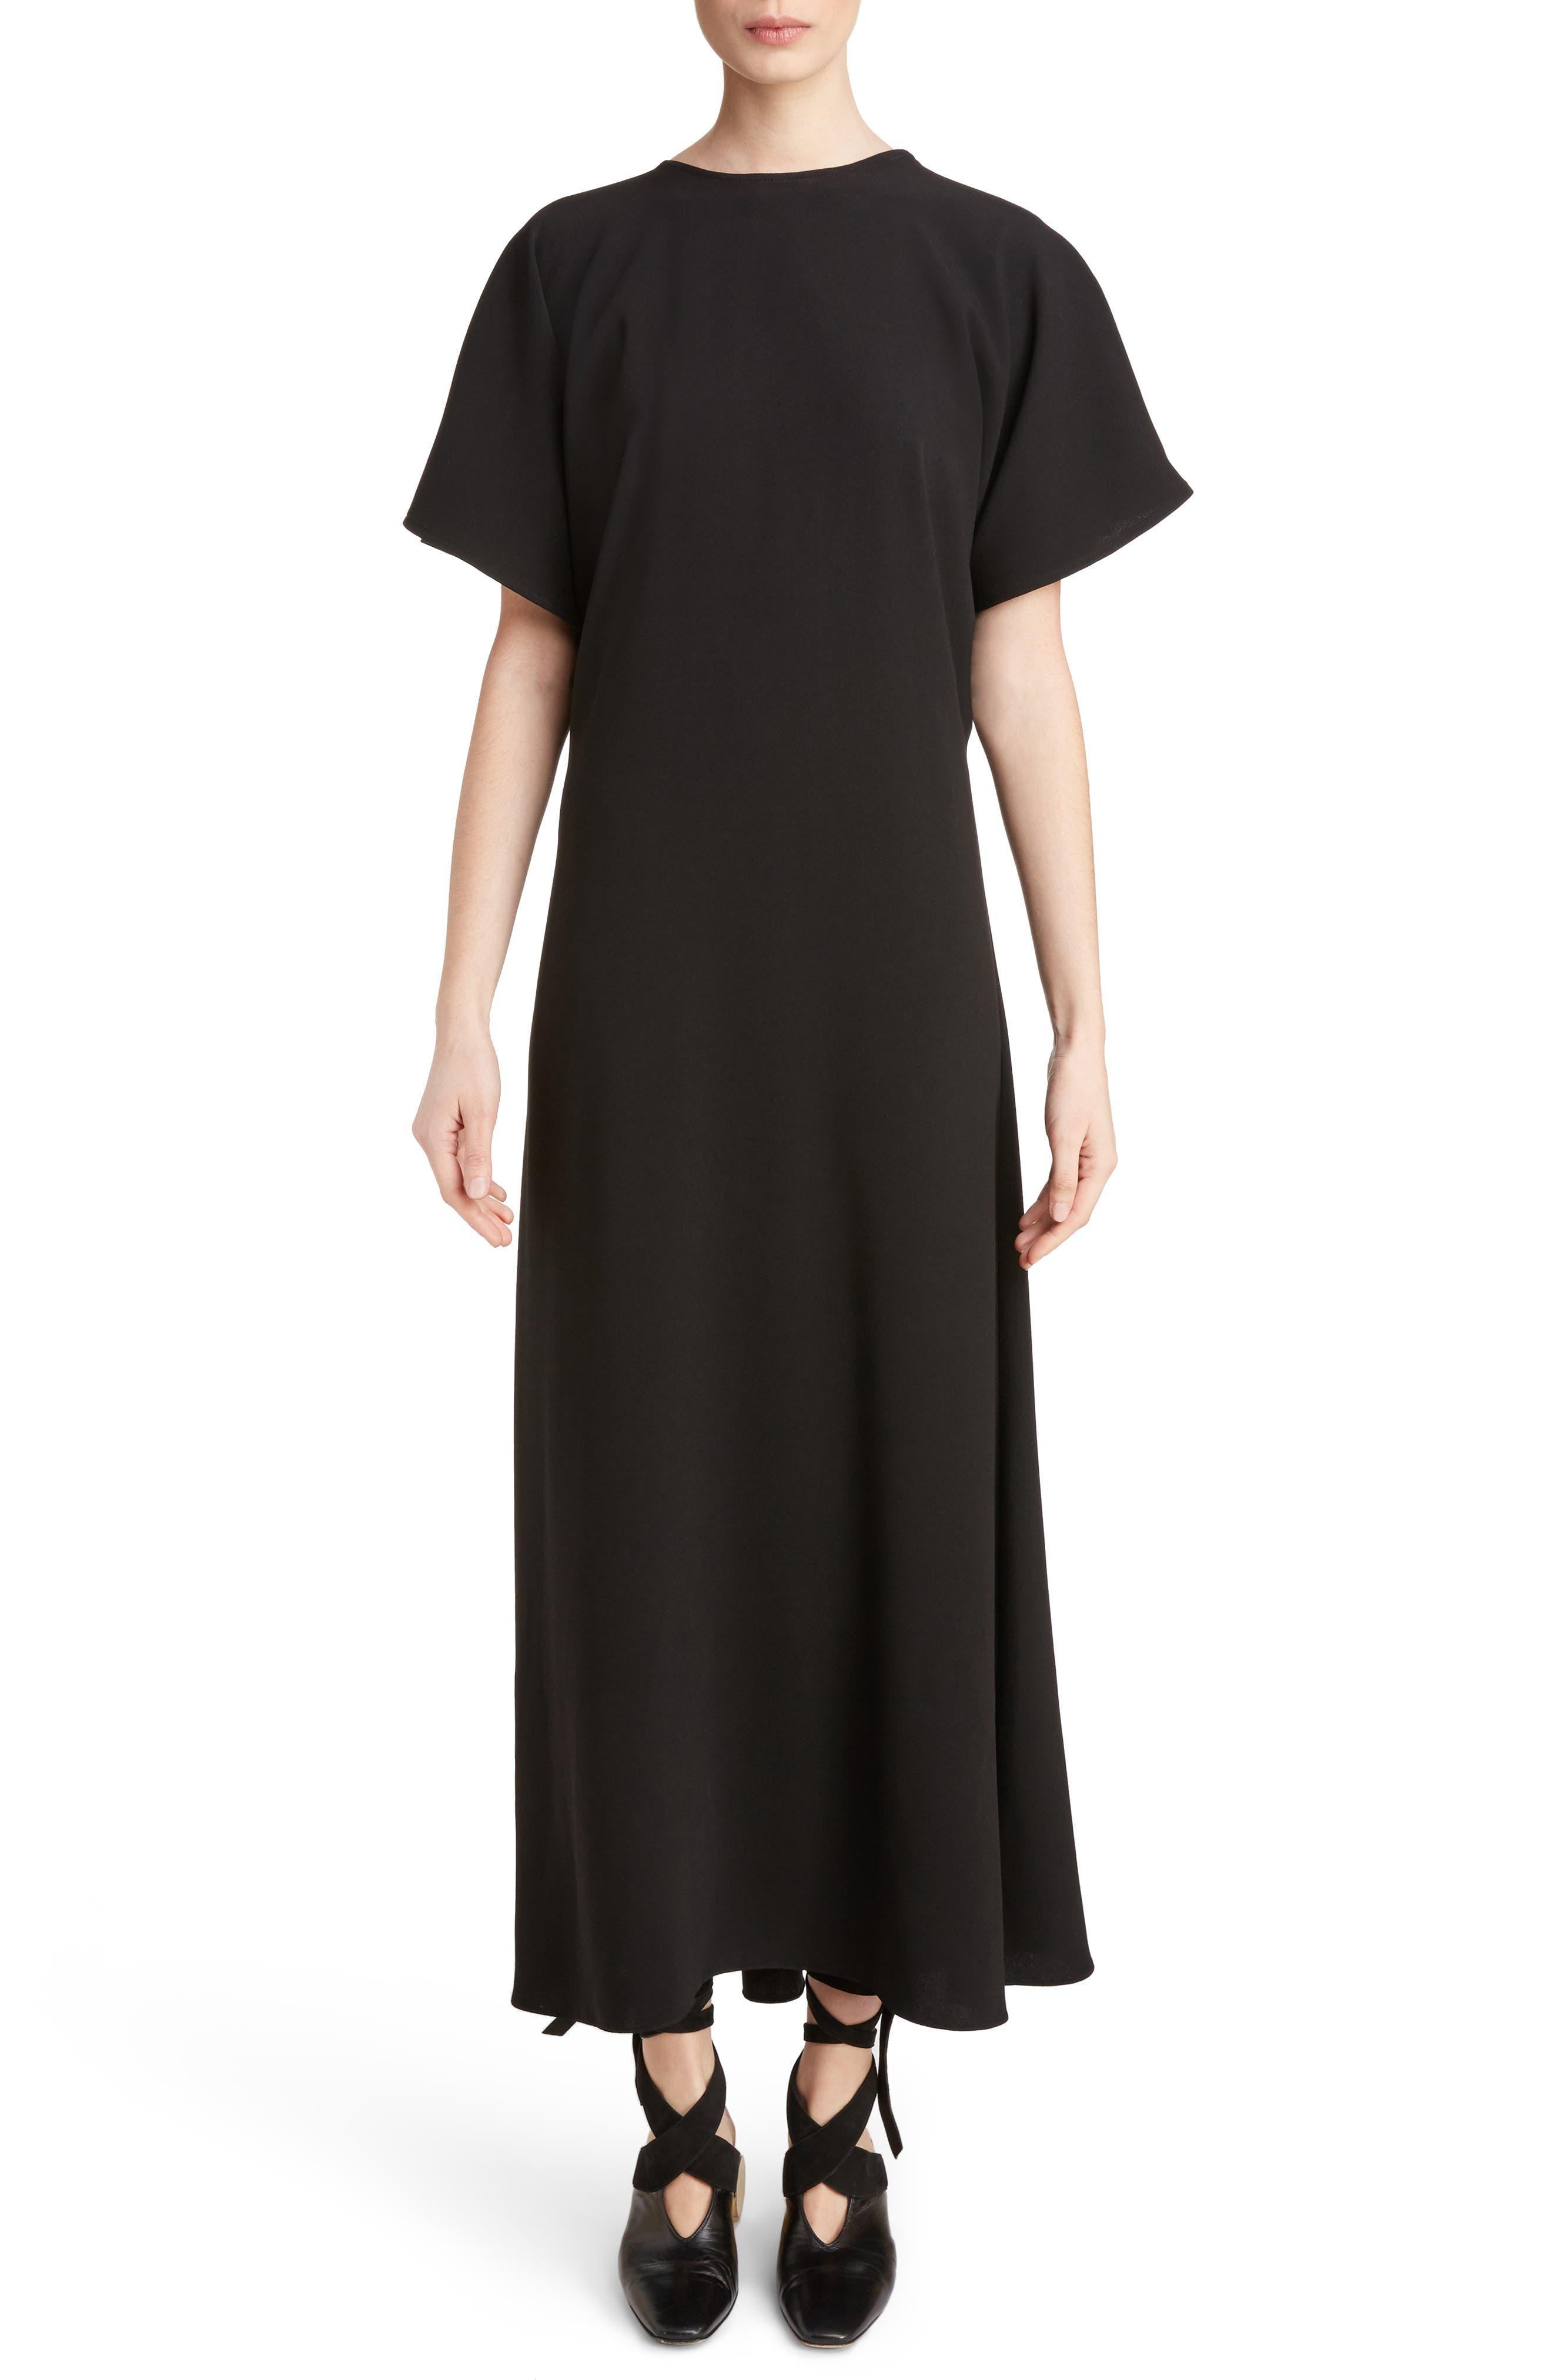 J.W.ANDERSON Cap Sleeve Maxi Dress,                         Main,                         color, 001